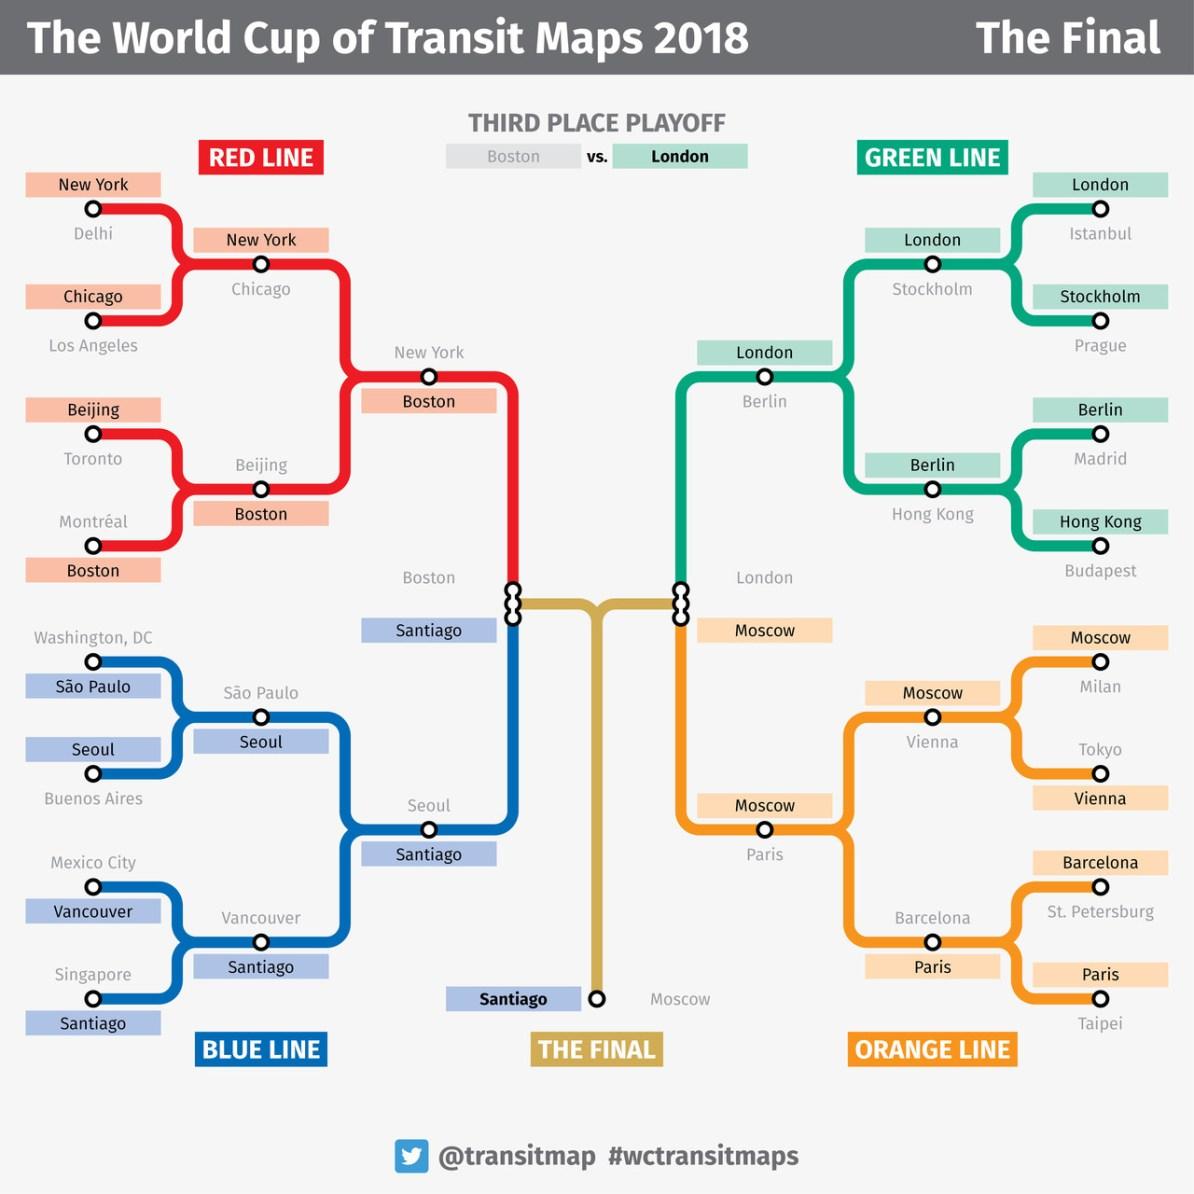 Bejing Subway Map 2018.Transit Maps The World Cup Of Transit Maps 2018